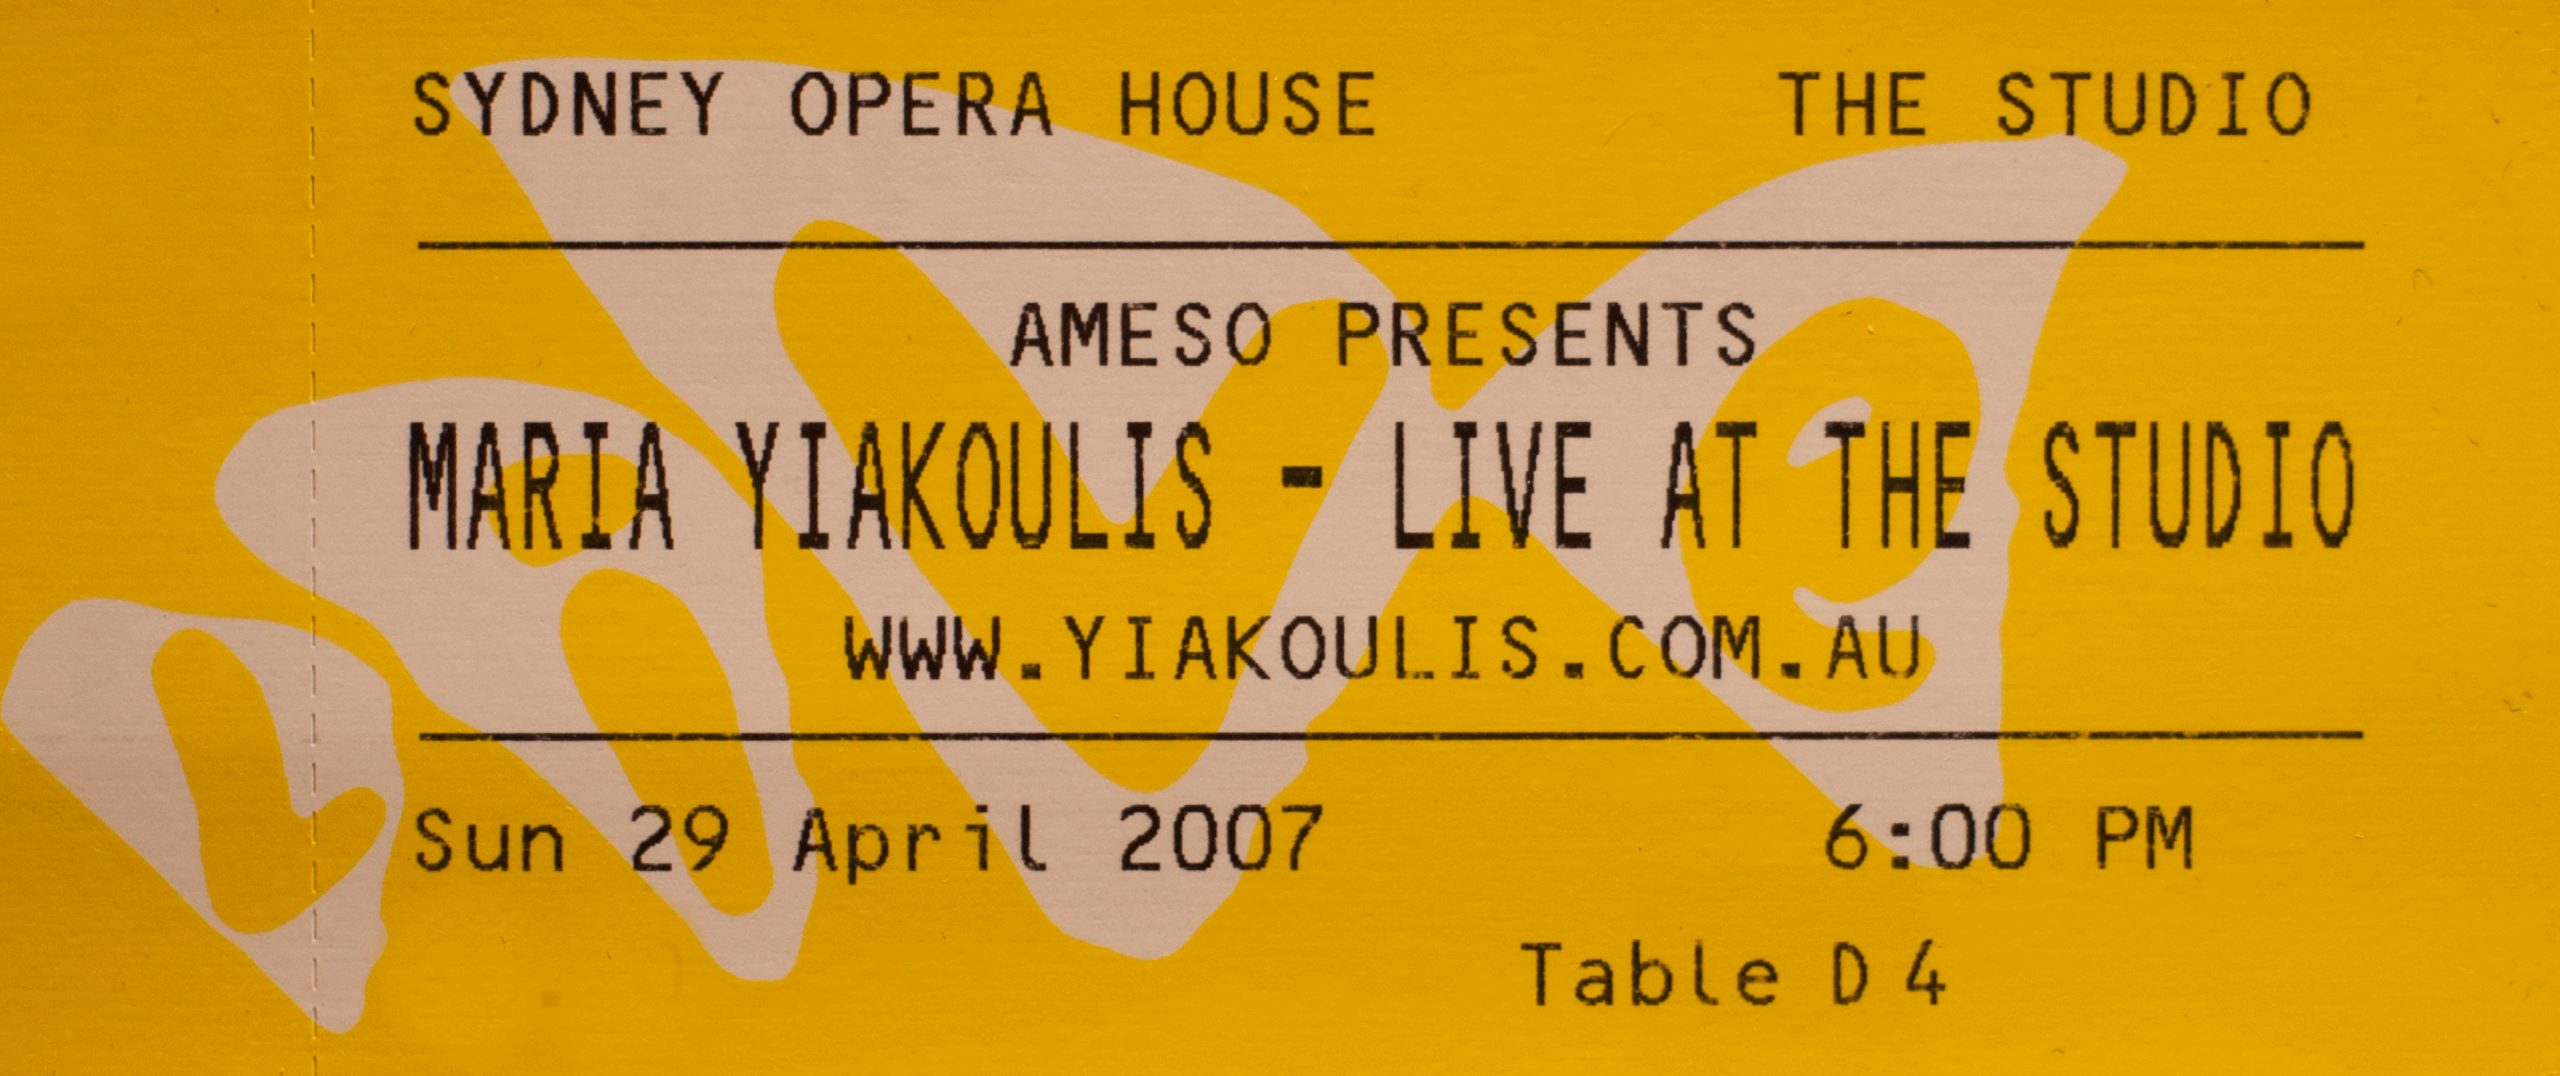 Maria Yiakoulis Live at the Studio 2007 Ticket